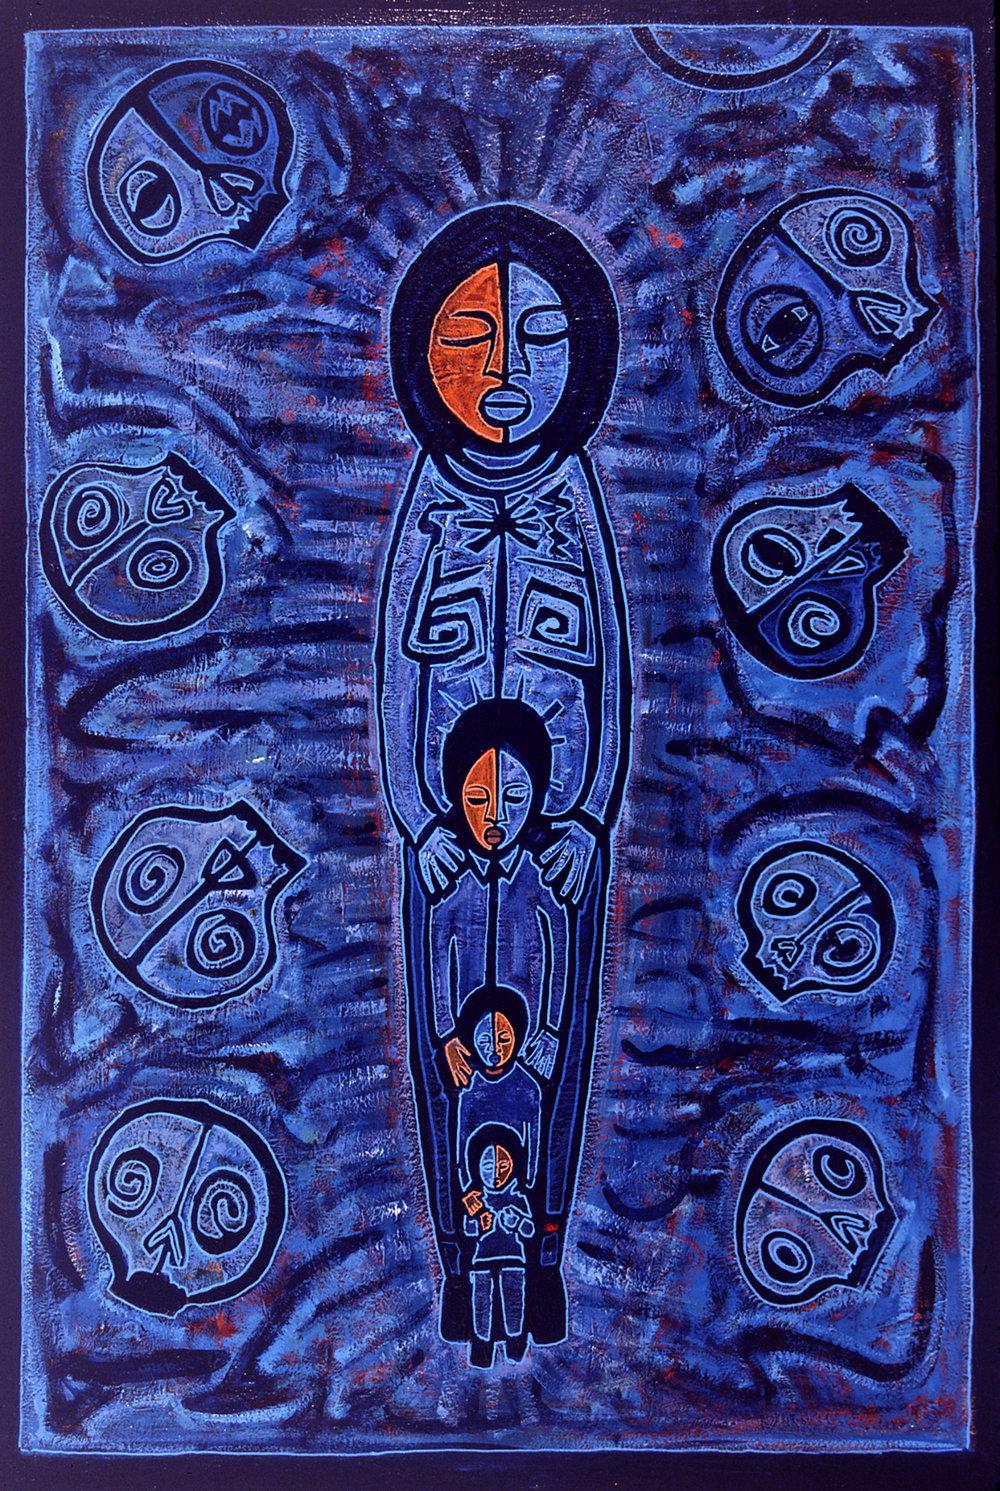 madre calaka, 2005, 33x48